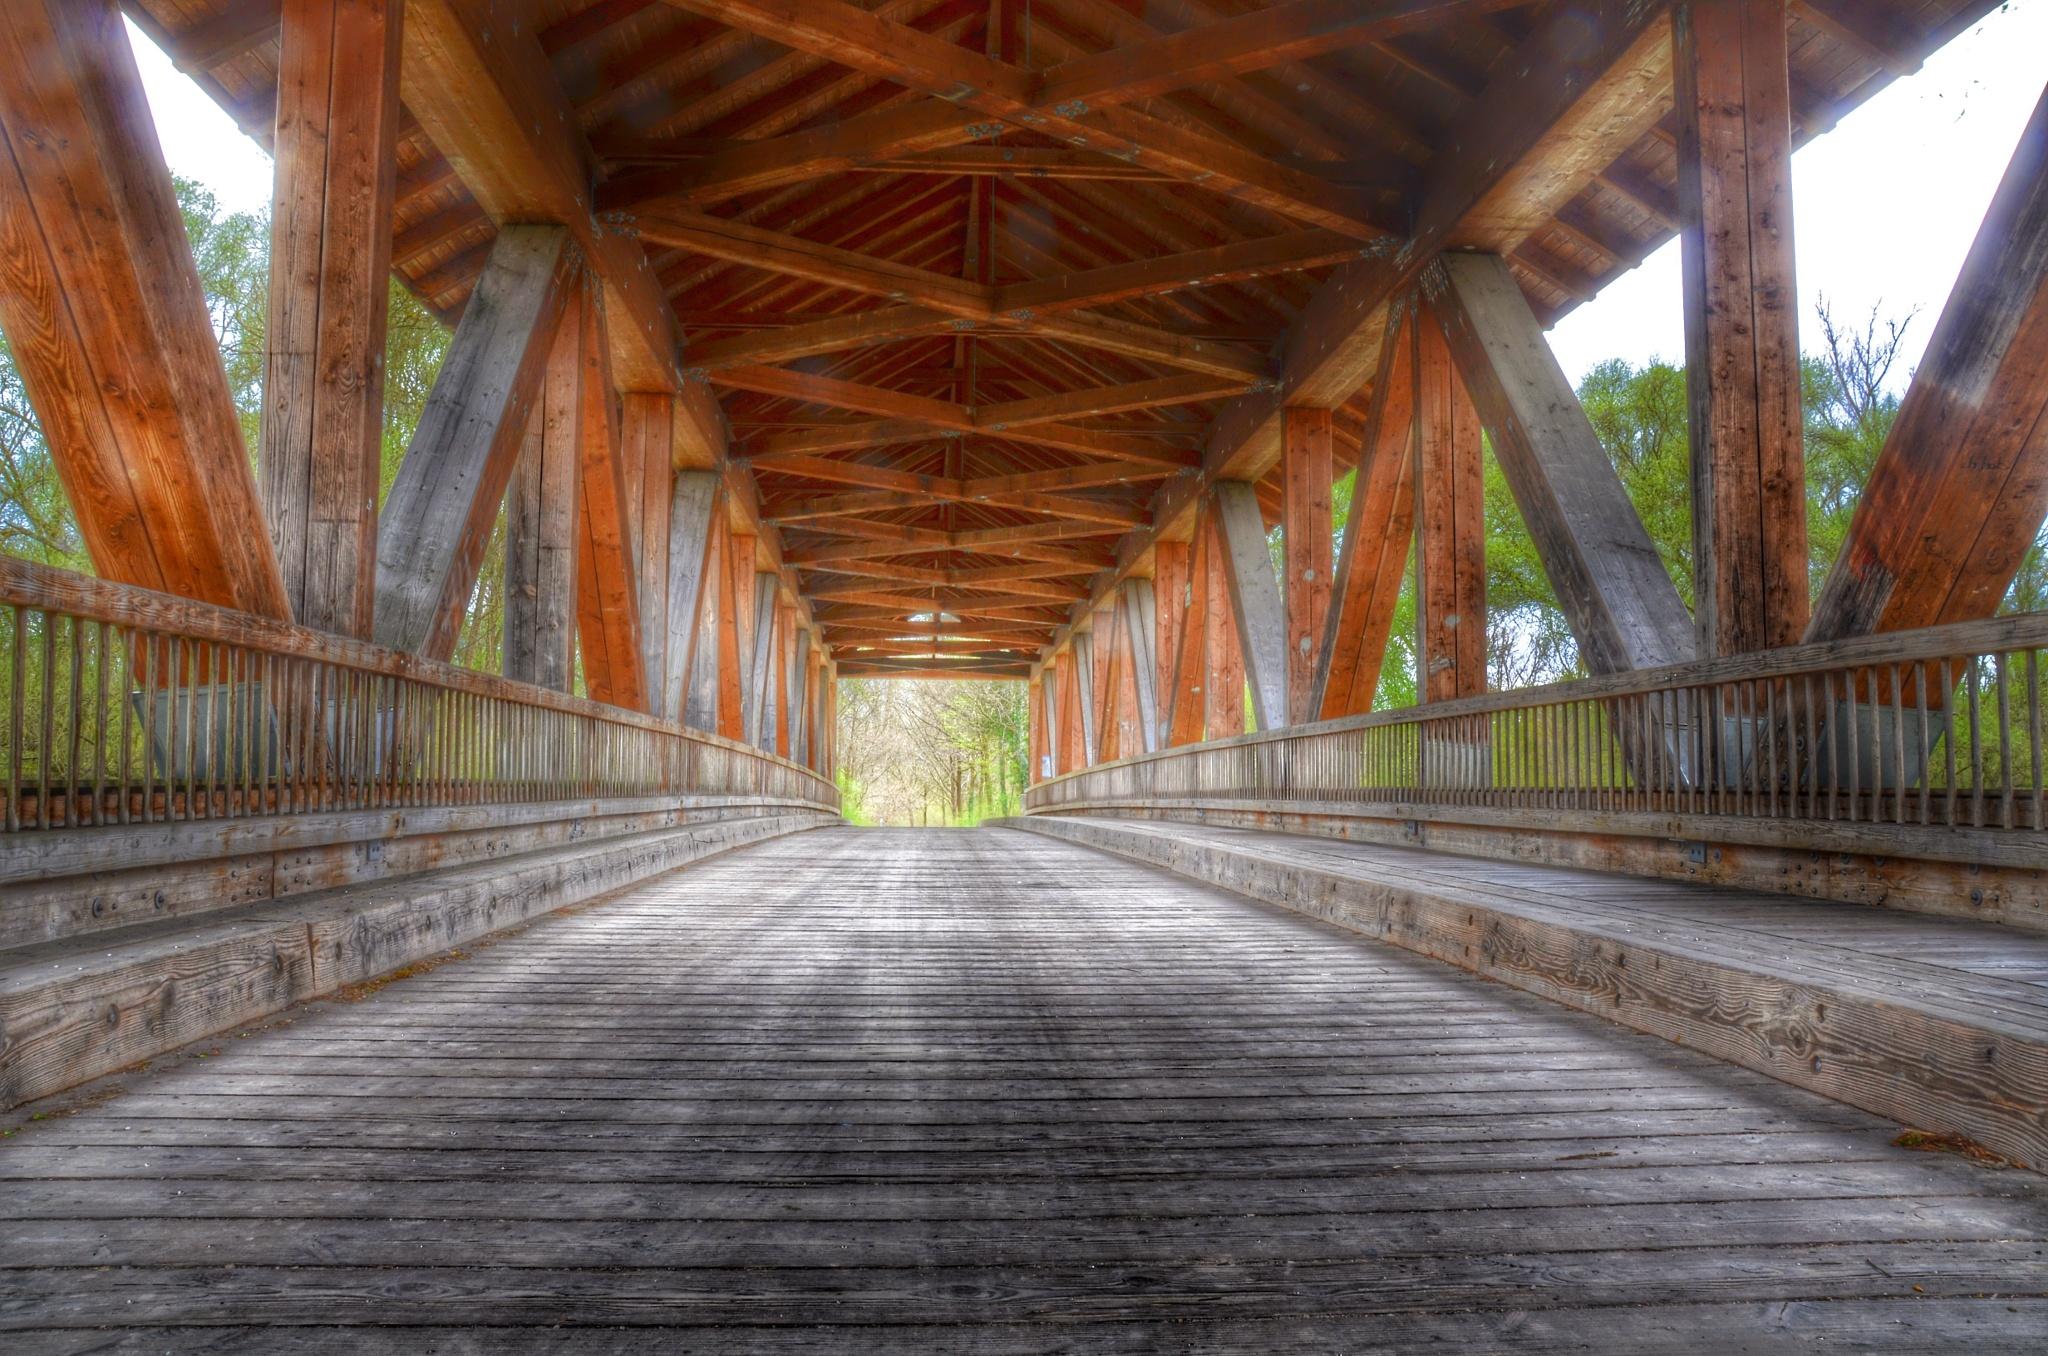 Bridge into the wild by Michael Näther